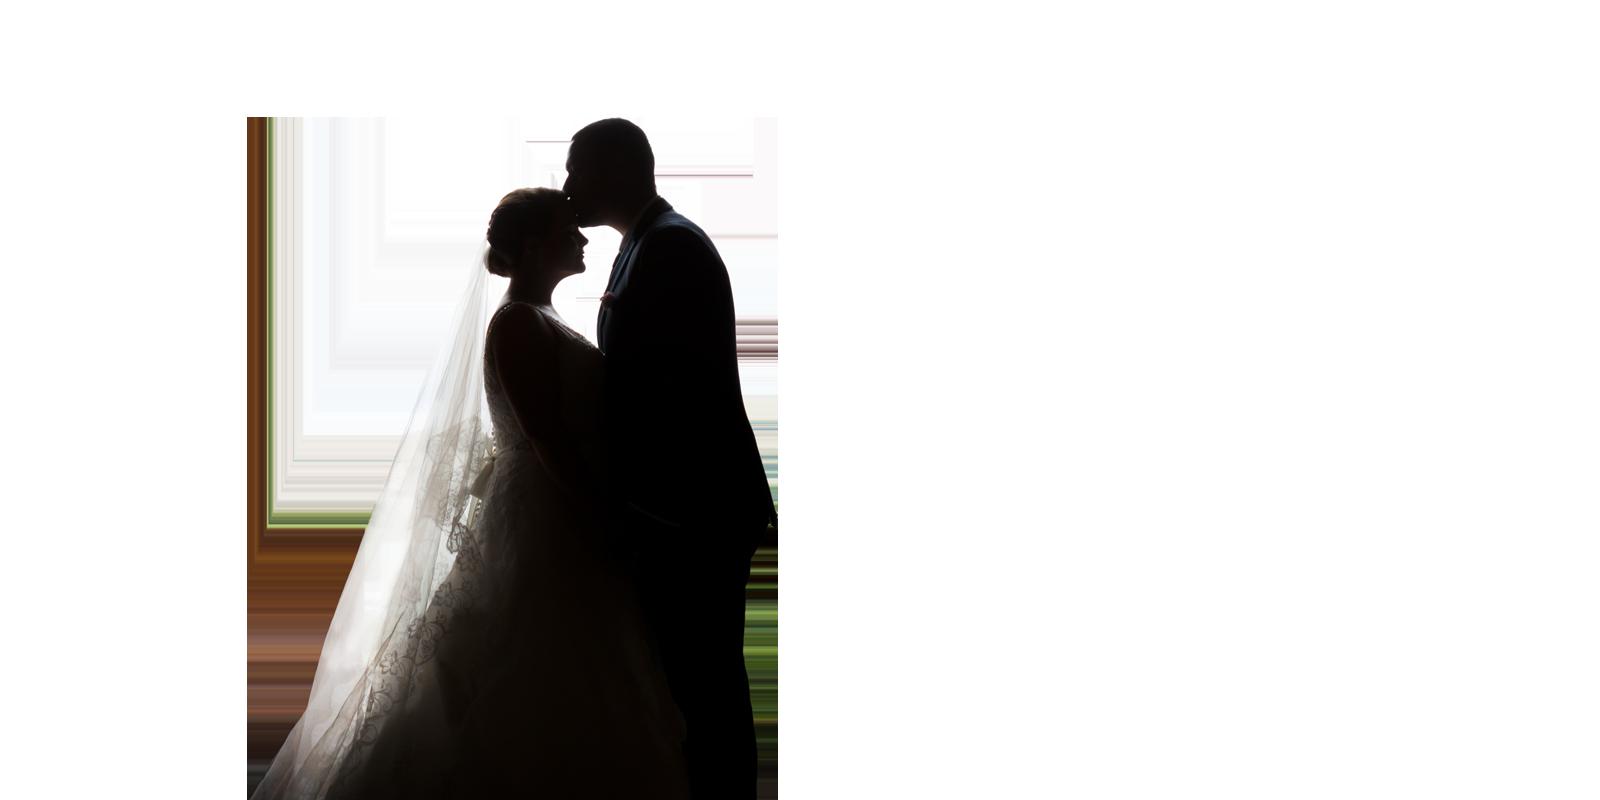 Couple png images free. Bride clipart transparent background